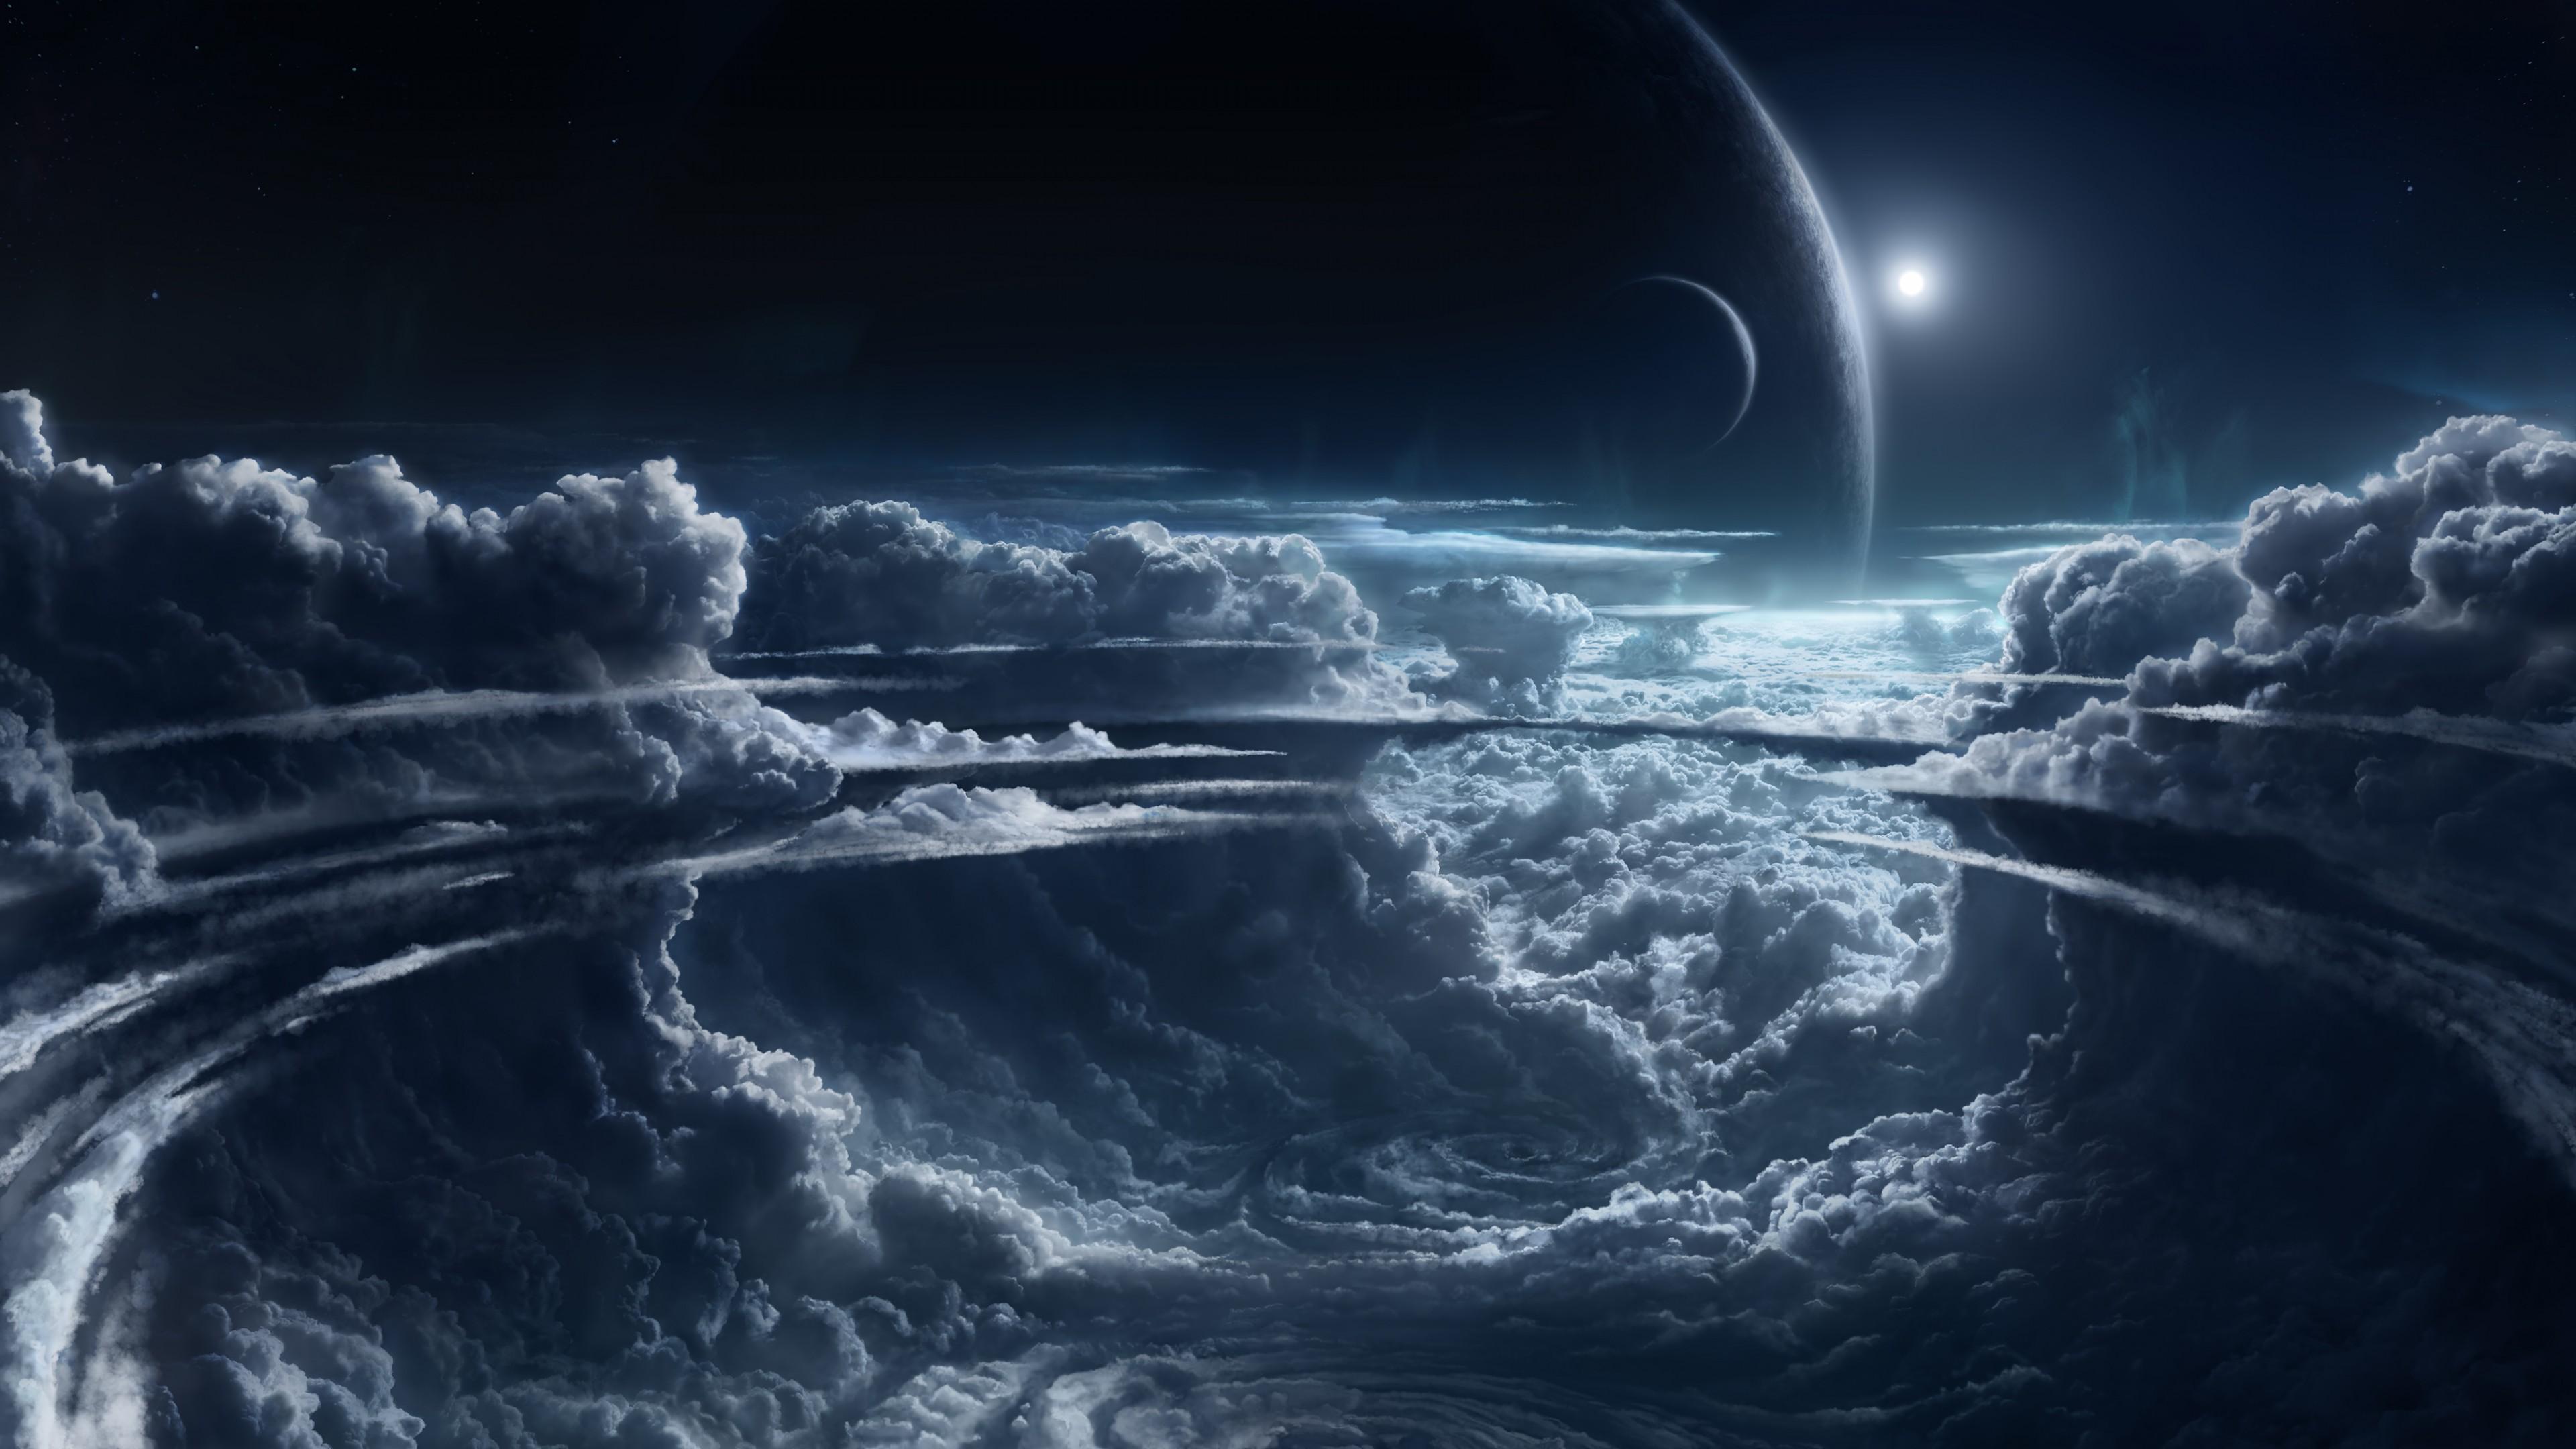 Wallpaper Sky 5k 4k wallpaper clouds planet light atmosphere 3840x2160